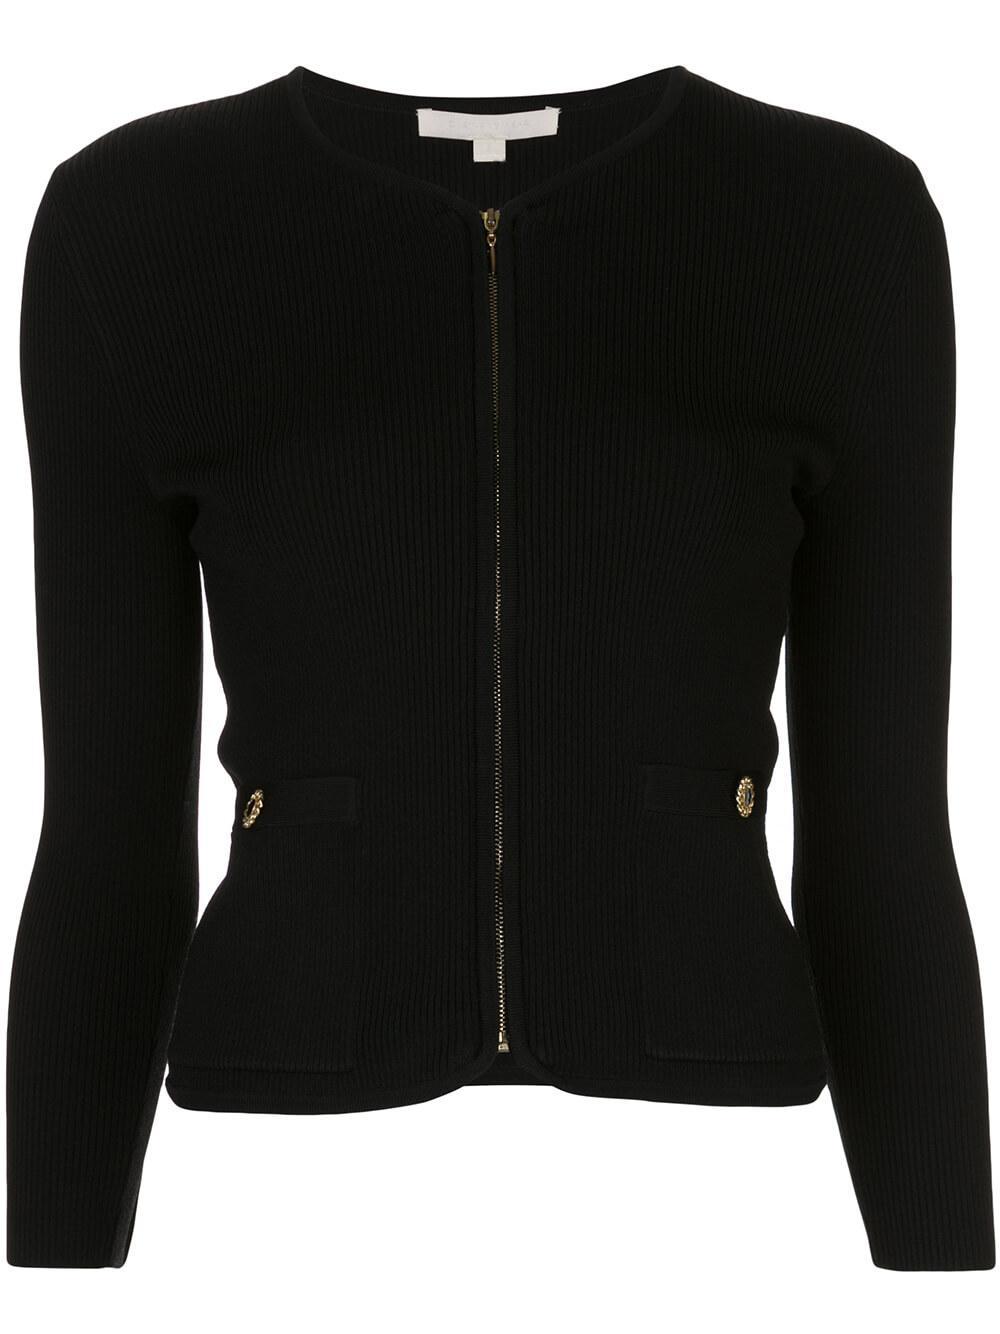 Long Sleeve Rib Knit Zip -Up Jacket